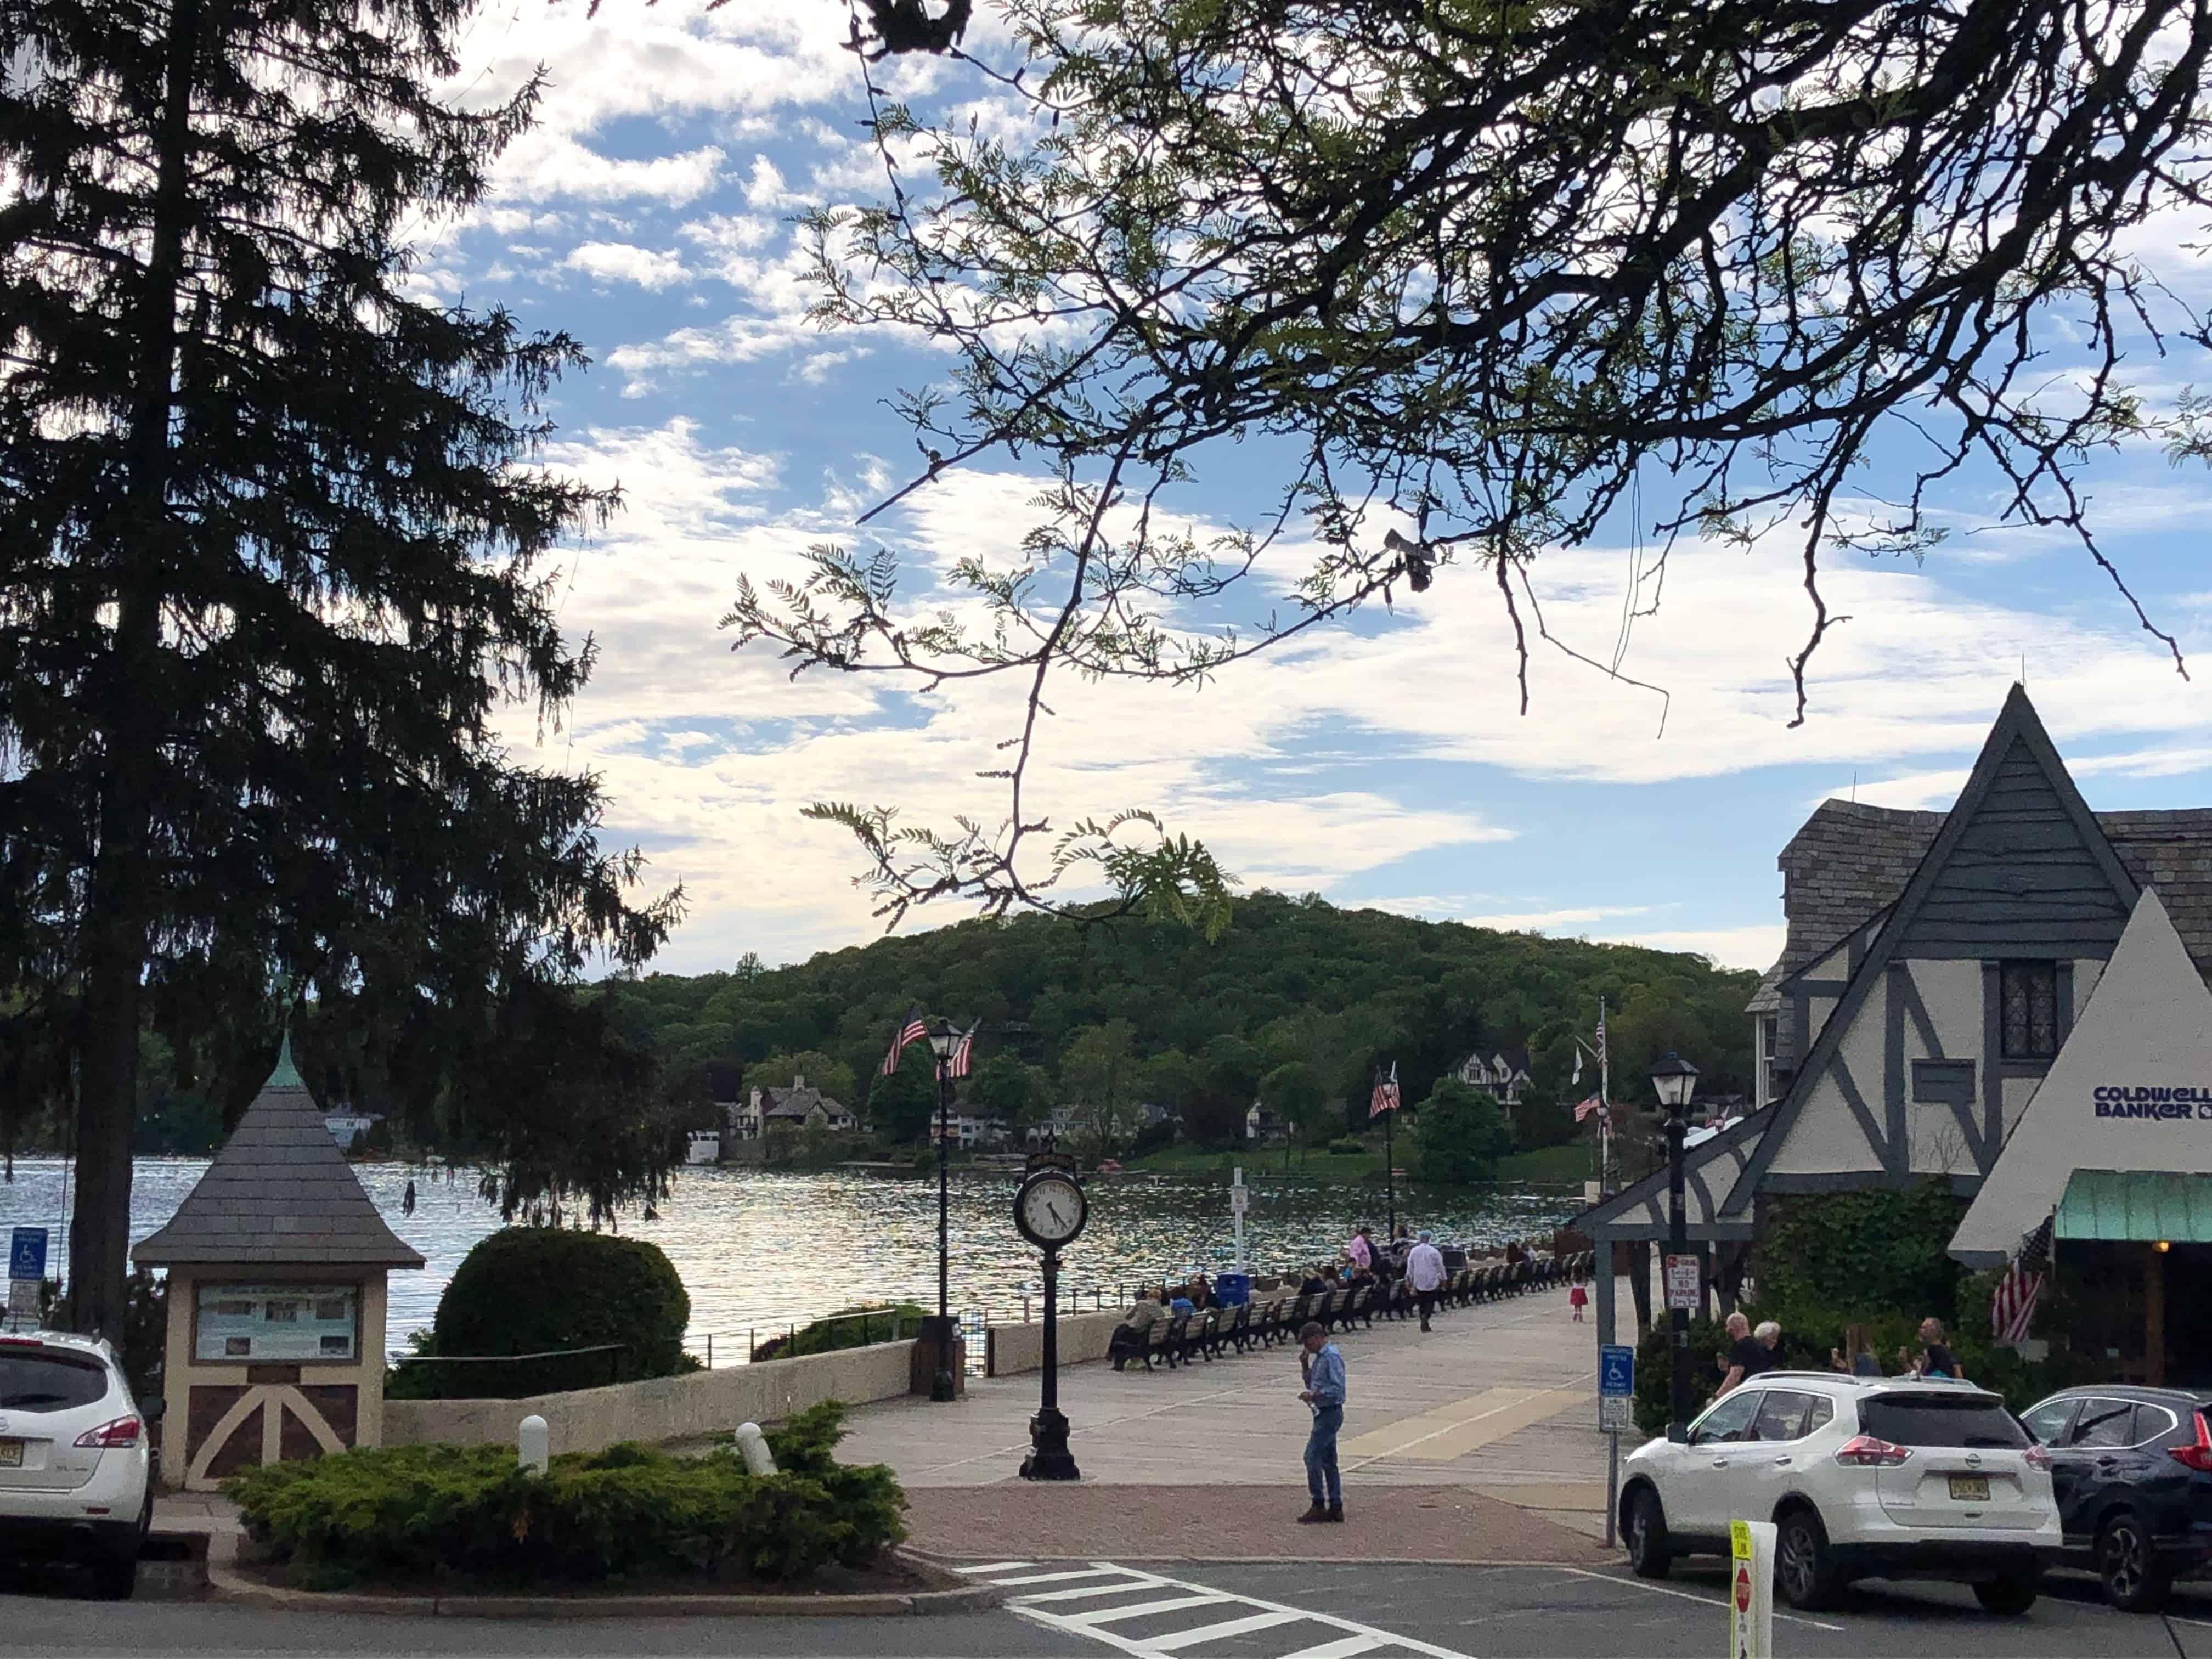 Sparta Lake Boardwalk